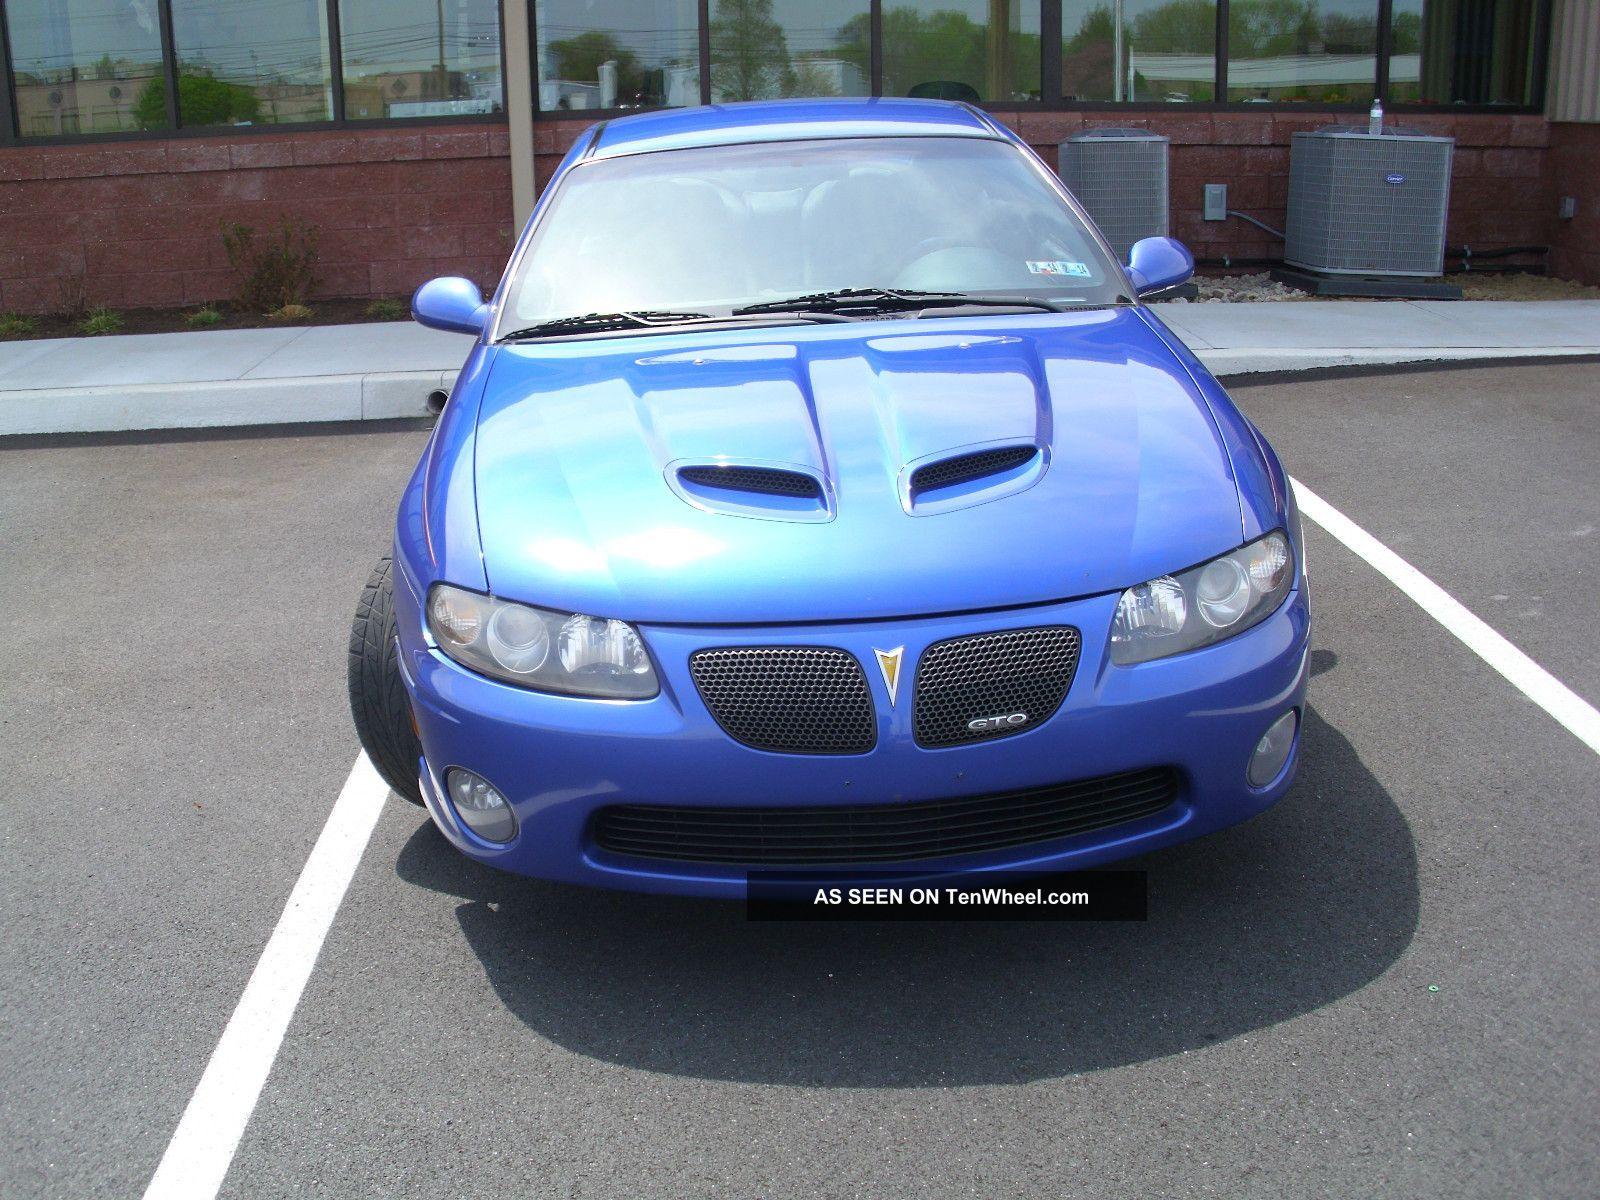 2005 Pontiac Gto 6. 0 Liter, Automatic / Overdrive, Blaupunkt 6 ...